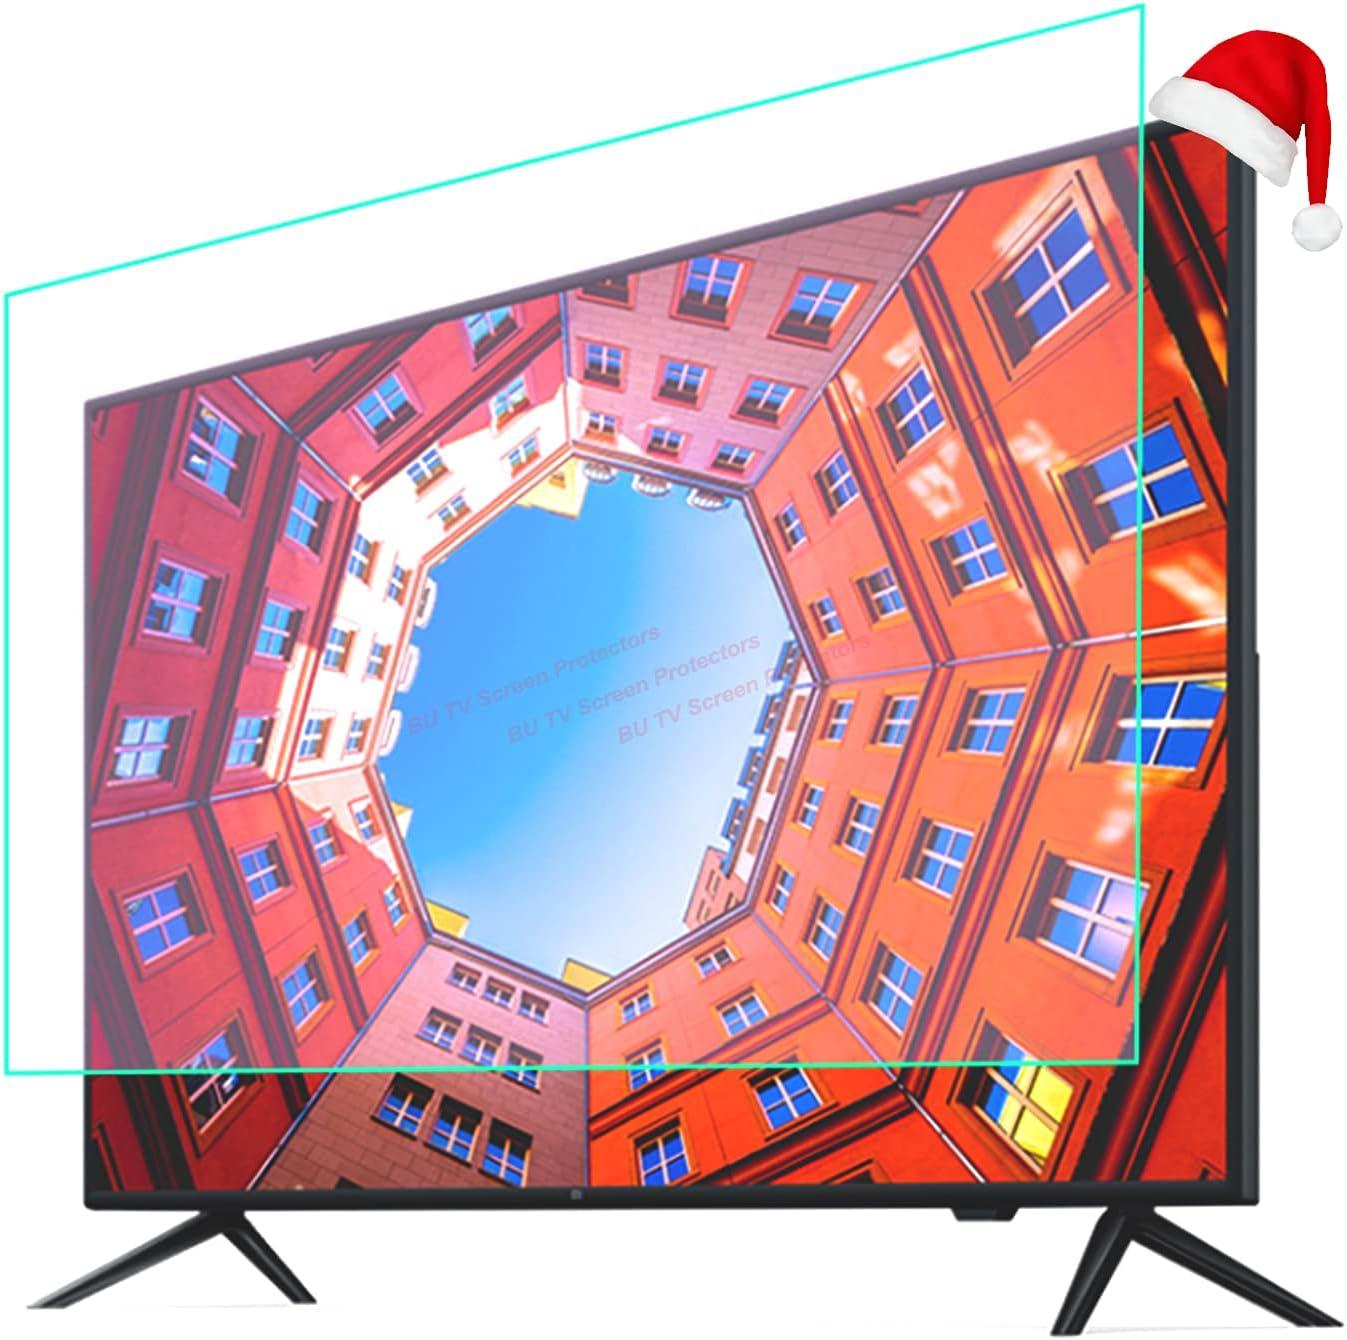 Omaha Mall 43-75 Inch TV Screen Protector Blue S Anti-Glare Light Anti Super sale period limited